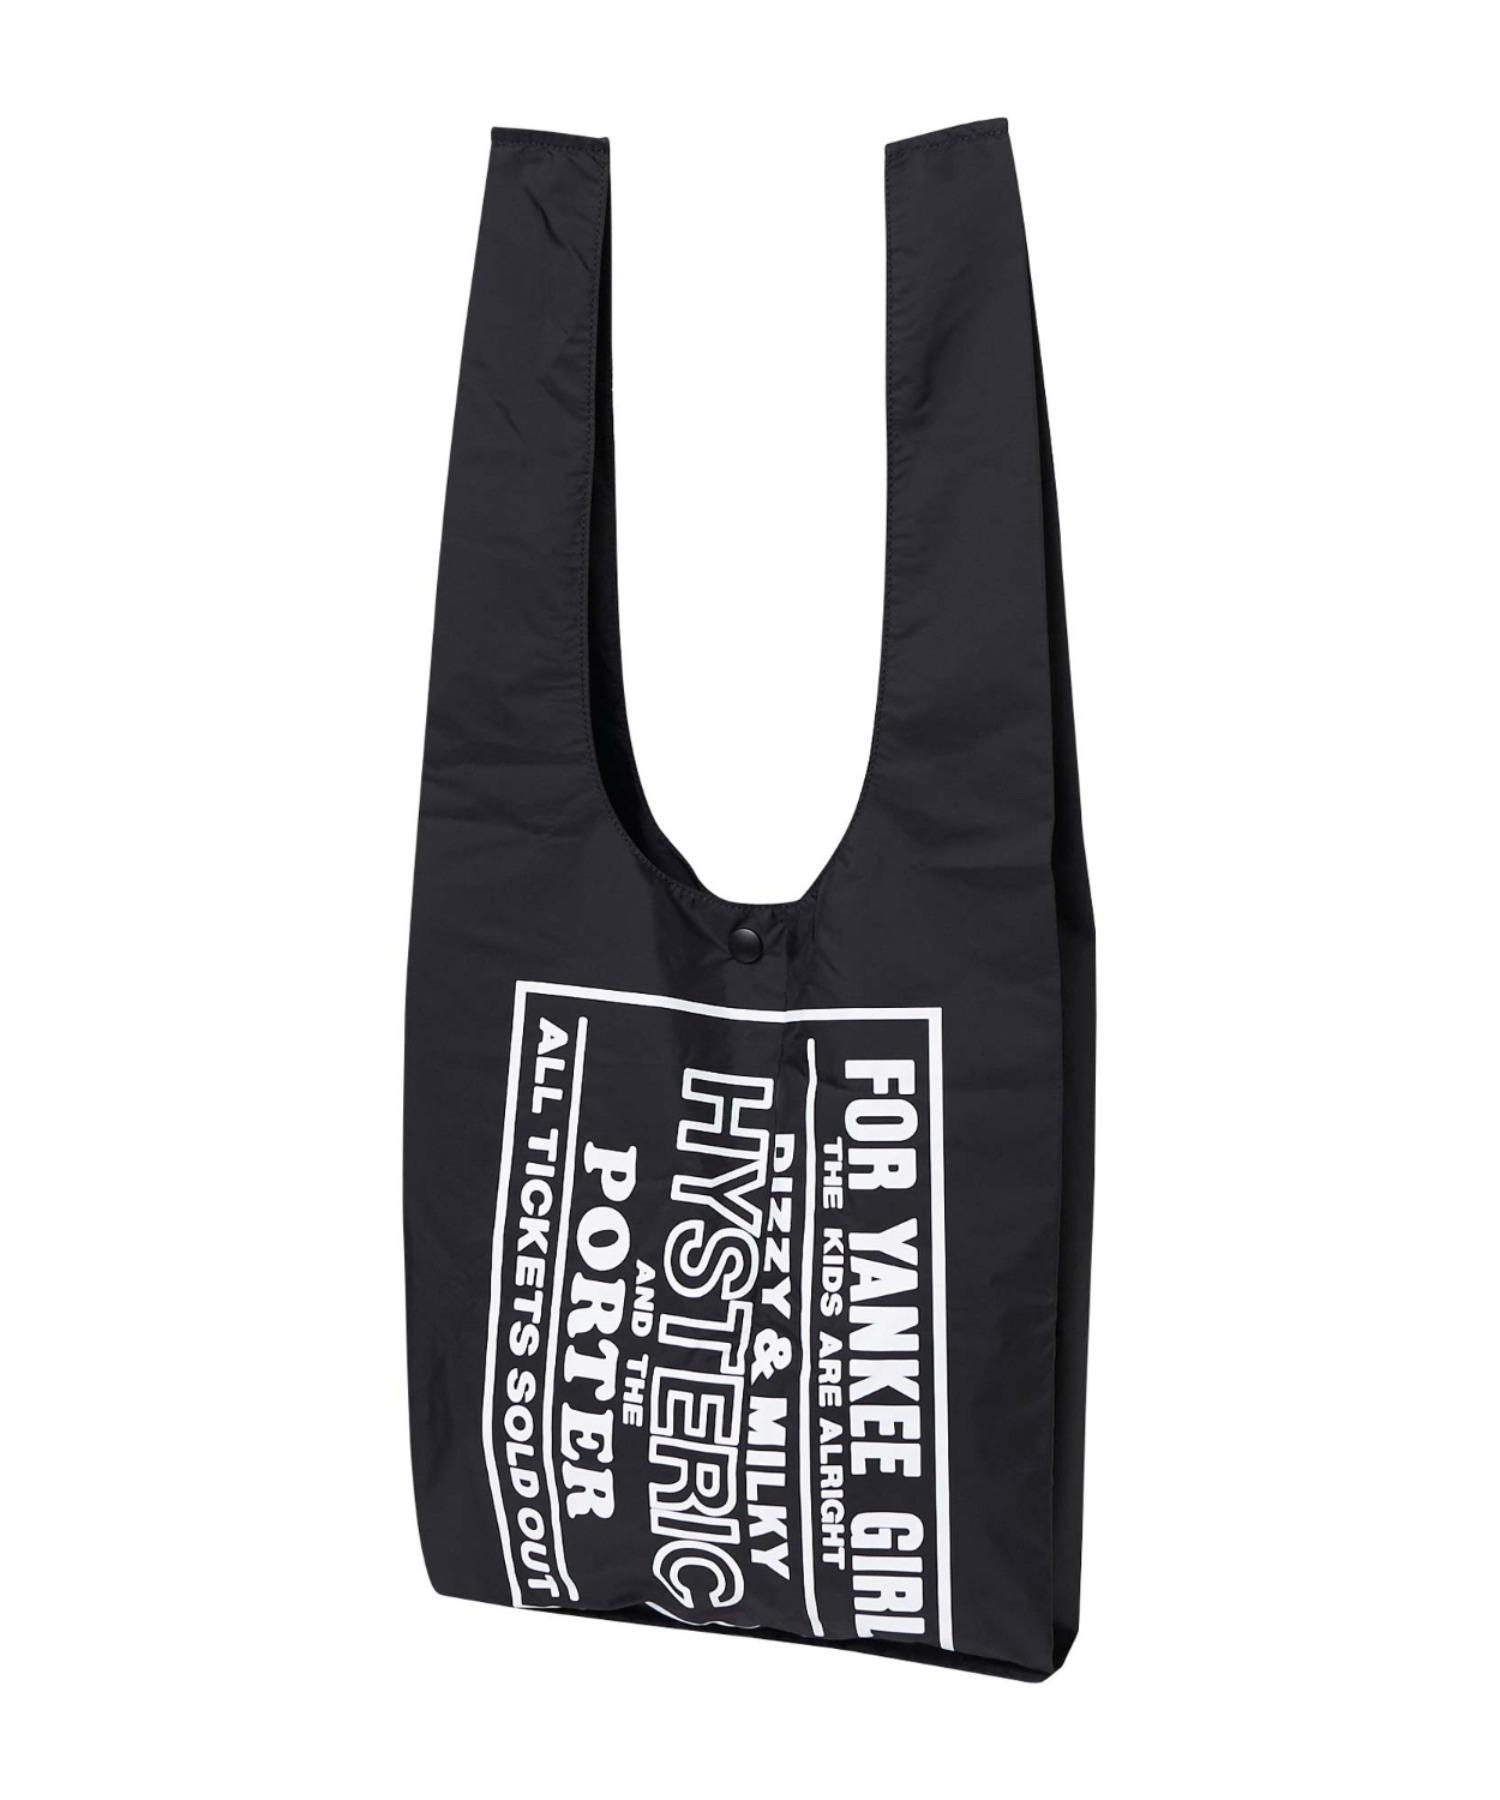 PORTER/パッカブル GROCERY BAG (S)